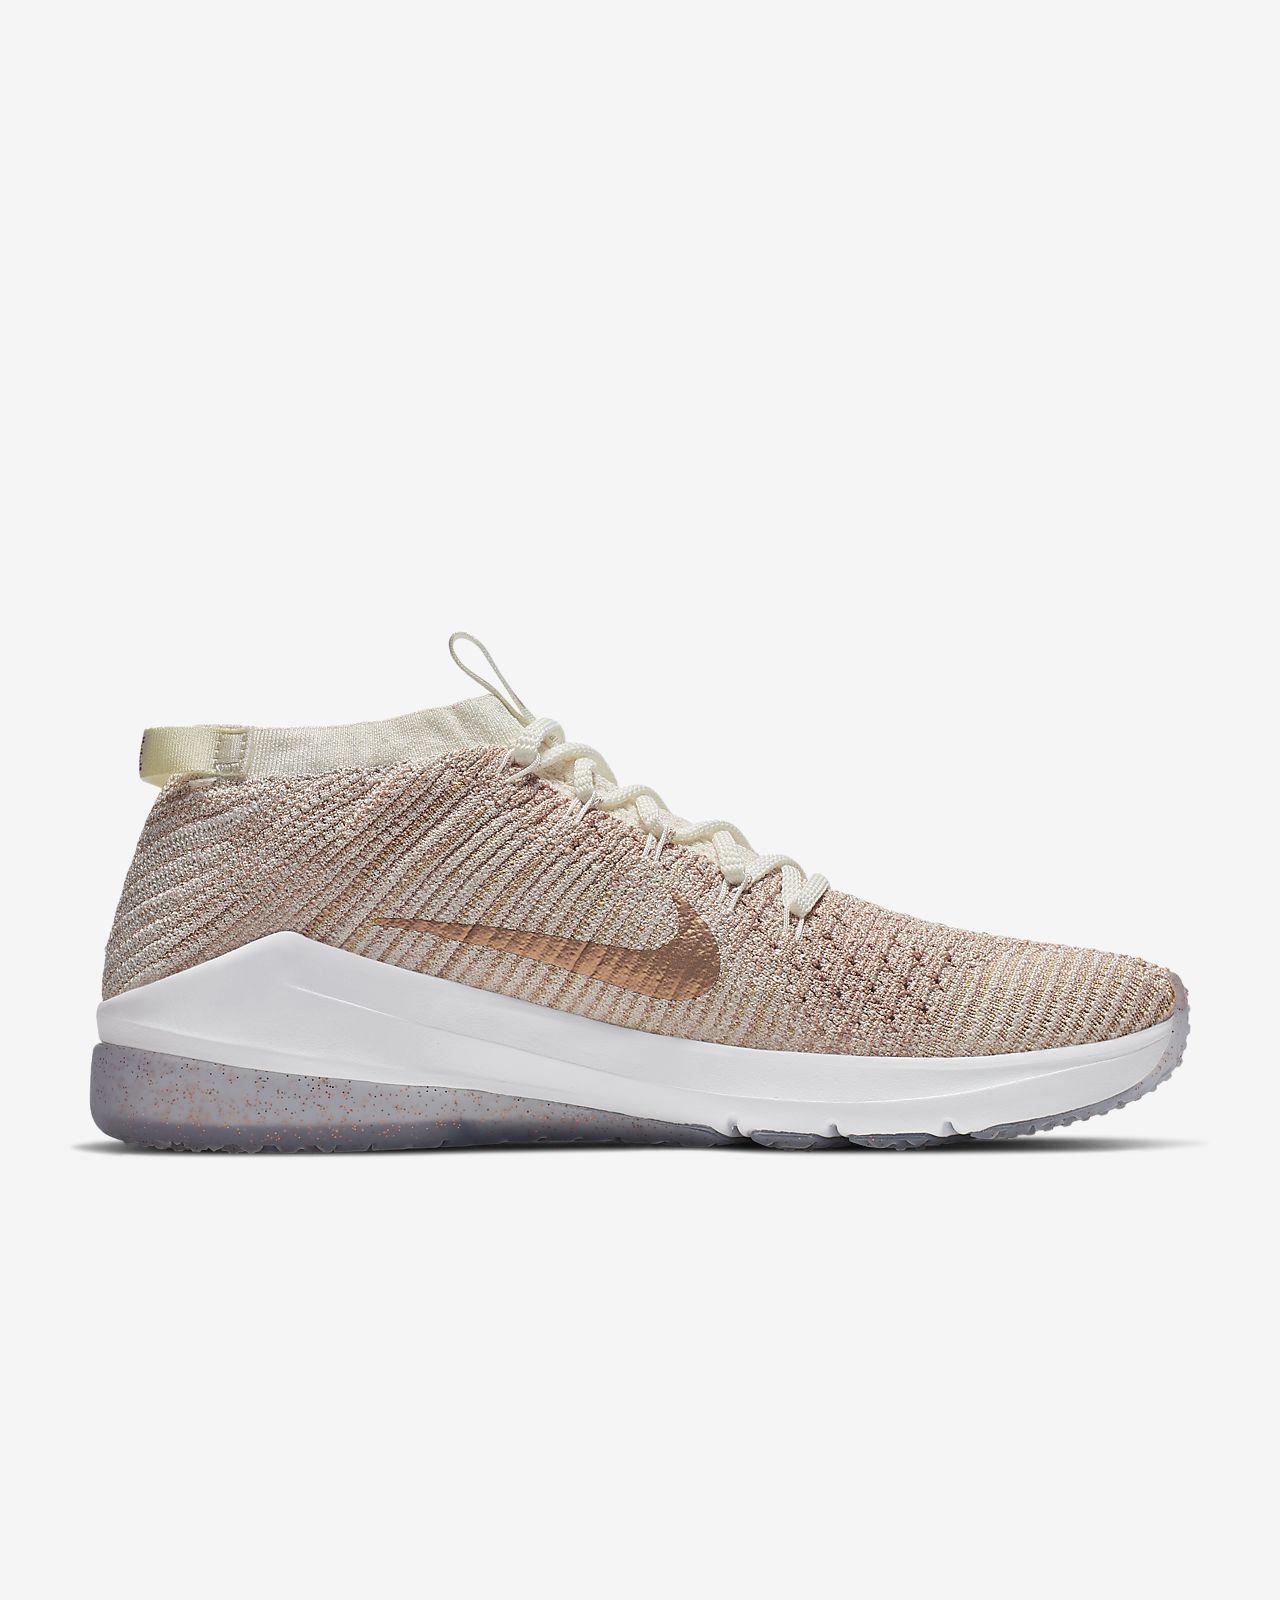 a59eed82c63 ... Sapatilhas de treino Nike Air Zoom Fearless Flyknit 2 Metallic para  mulher